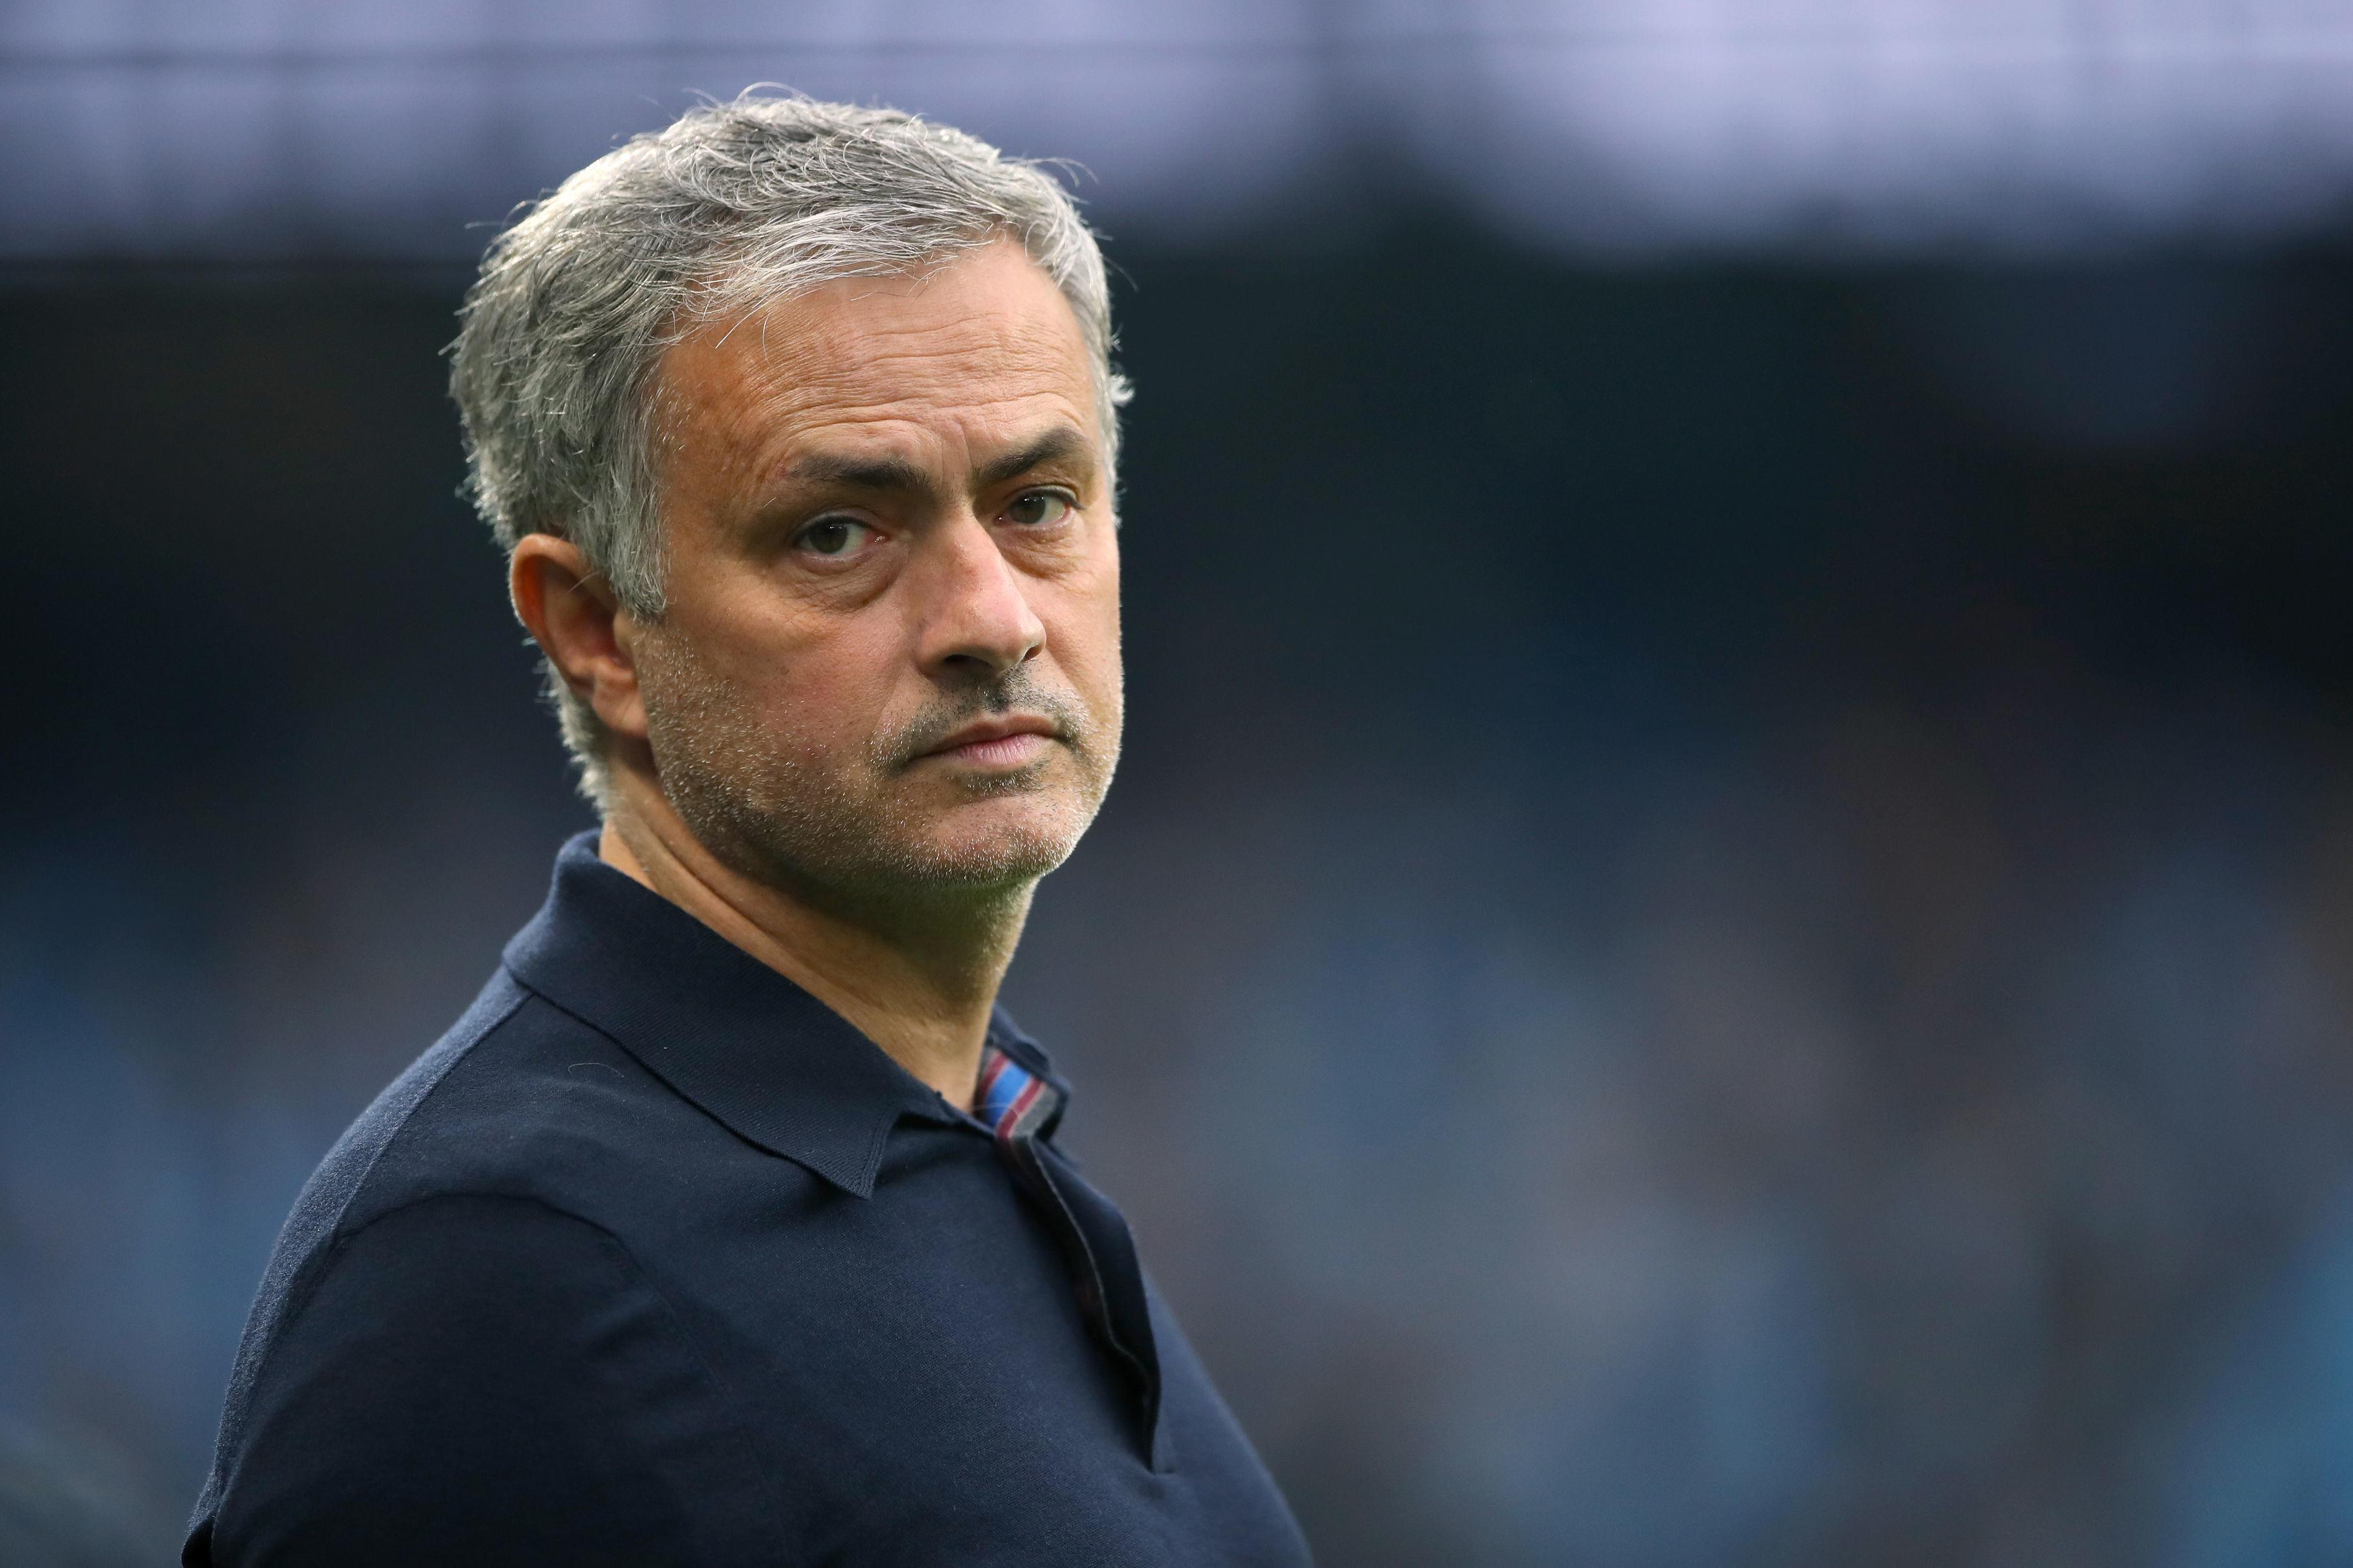 Ex-Man Utd and Chelsea boss Jose Mourinho eyeing Spurs job ...